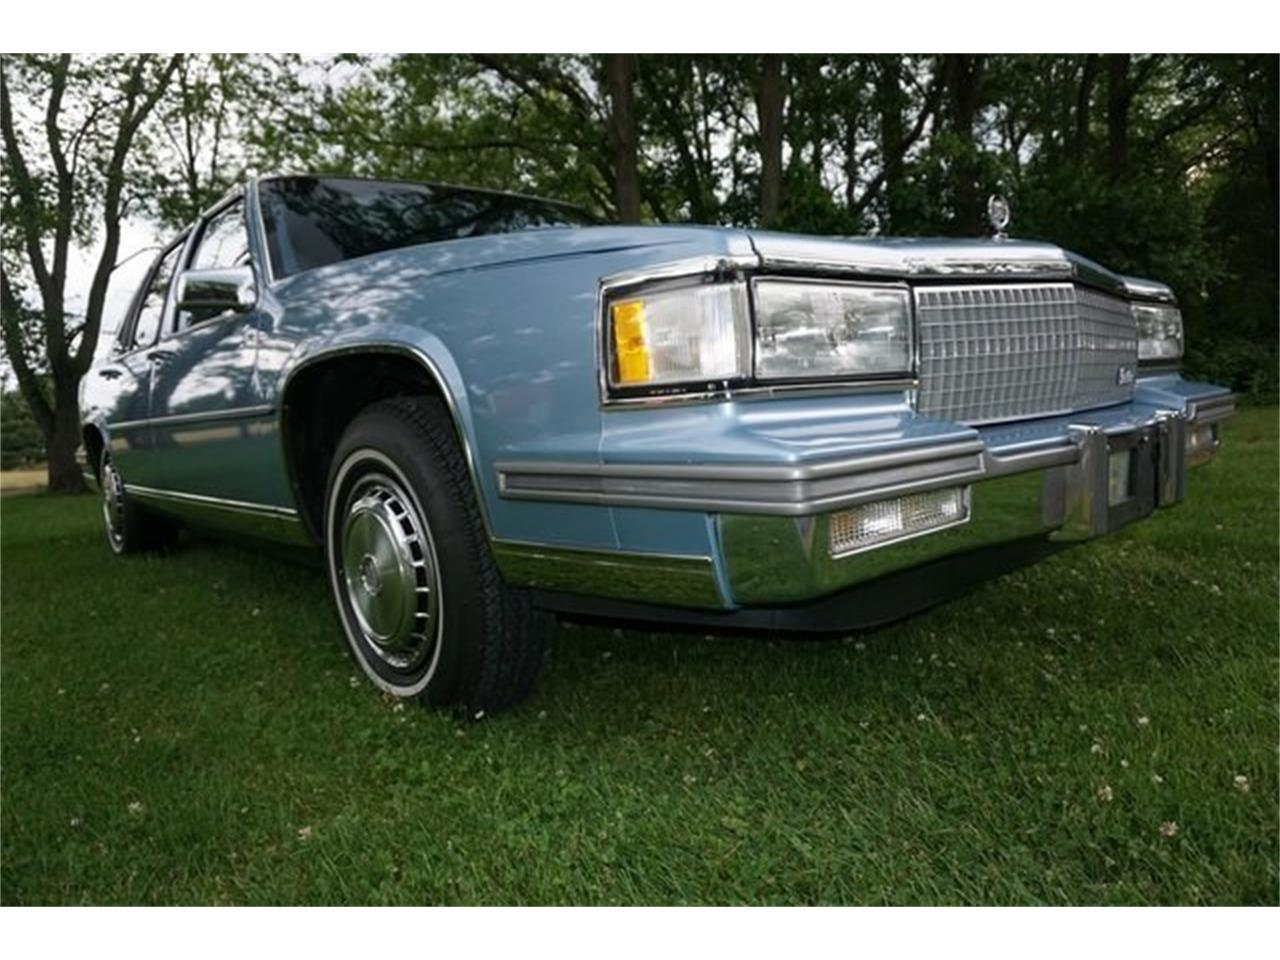 Large Picture of '87 Cadillac Sedan DeVille - $8,950.00 - QQIS